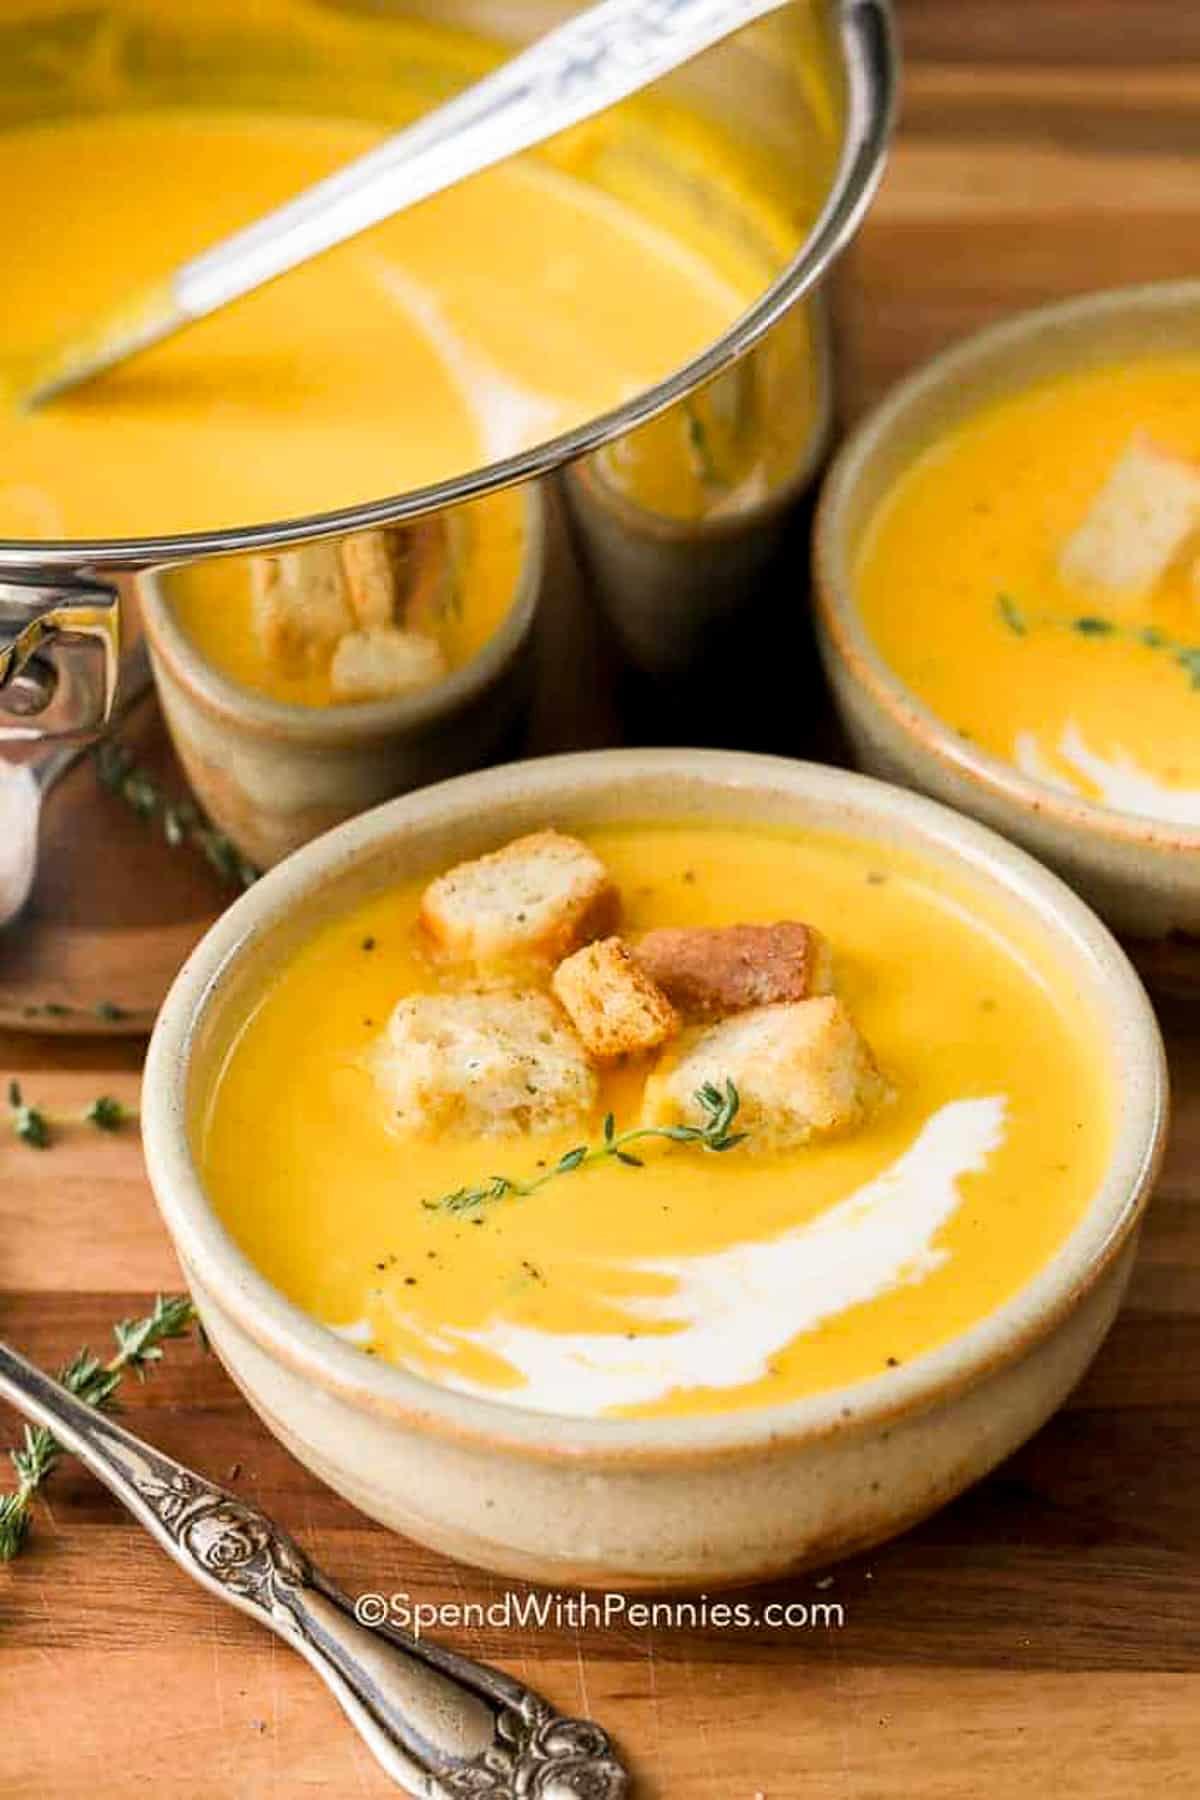 Butternut squash leves – költsd el fillérekért